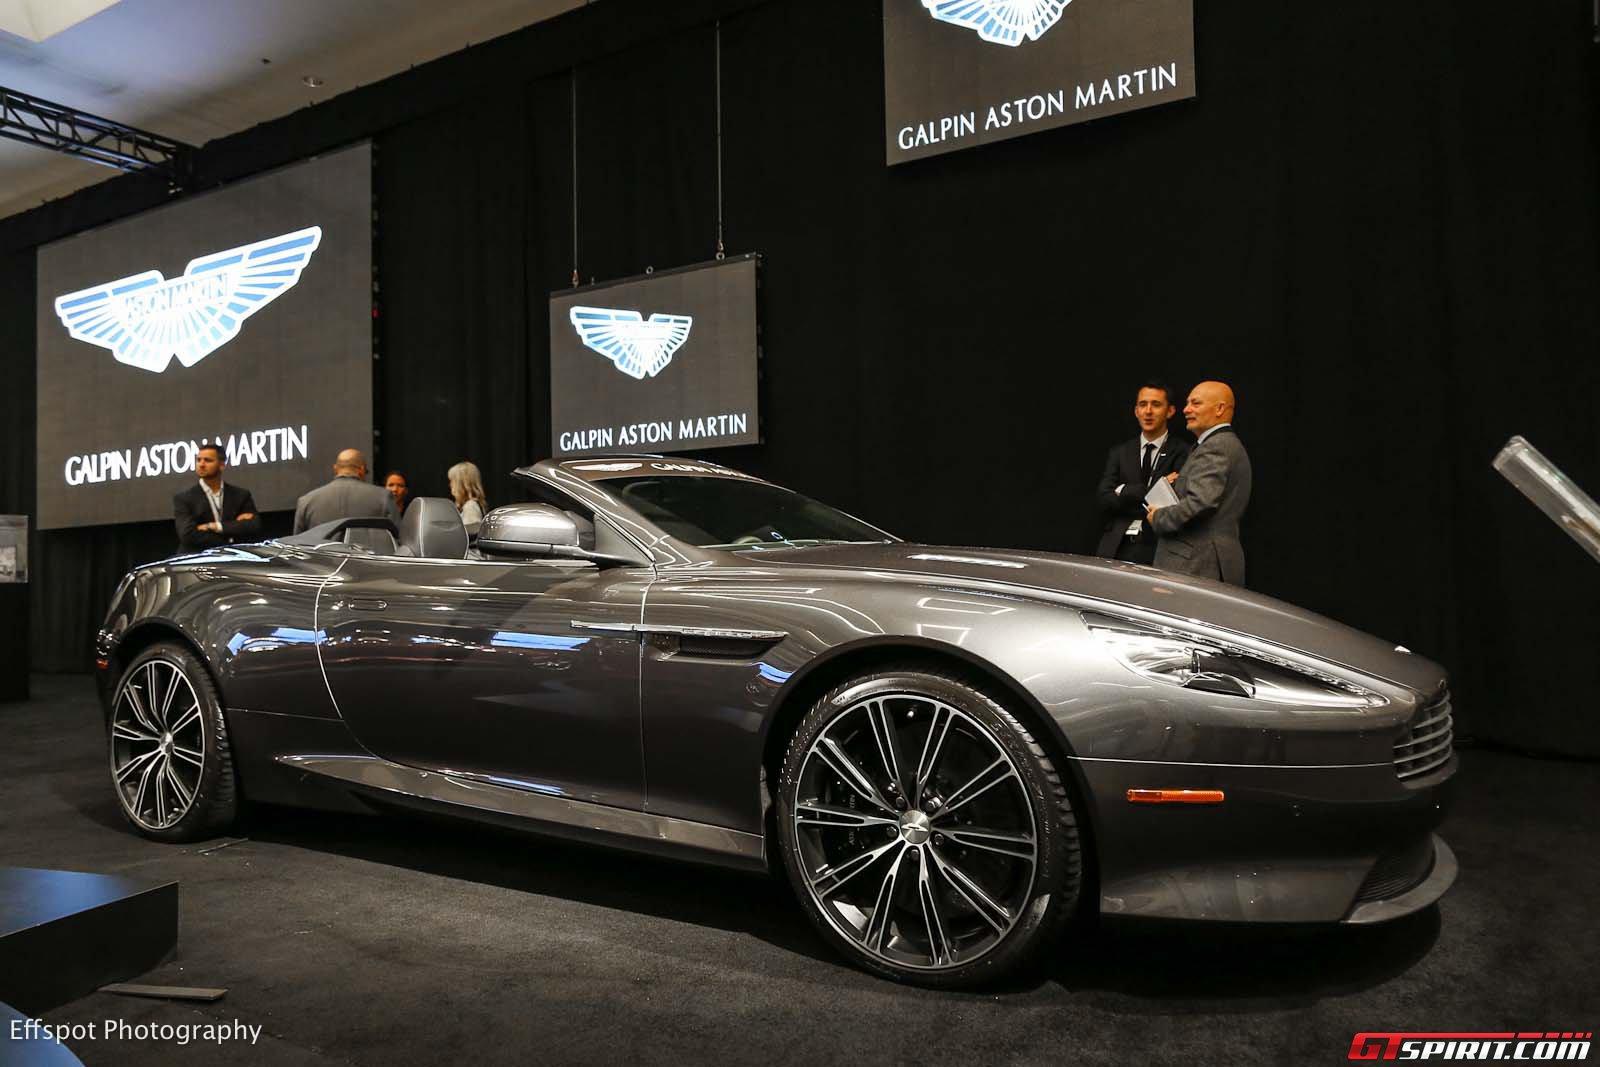 Quotes About Aston Martin Quotes - Galpin aston martin